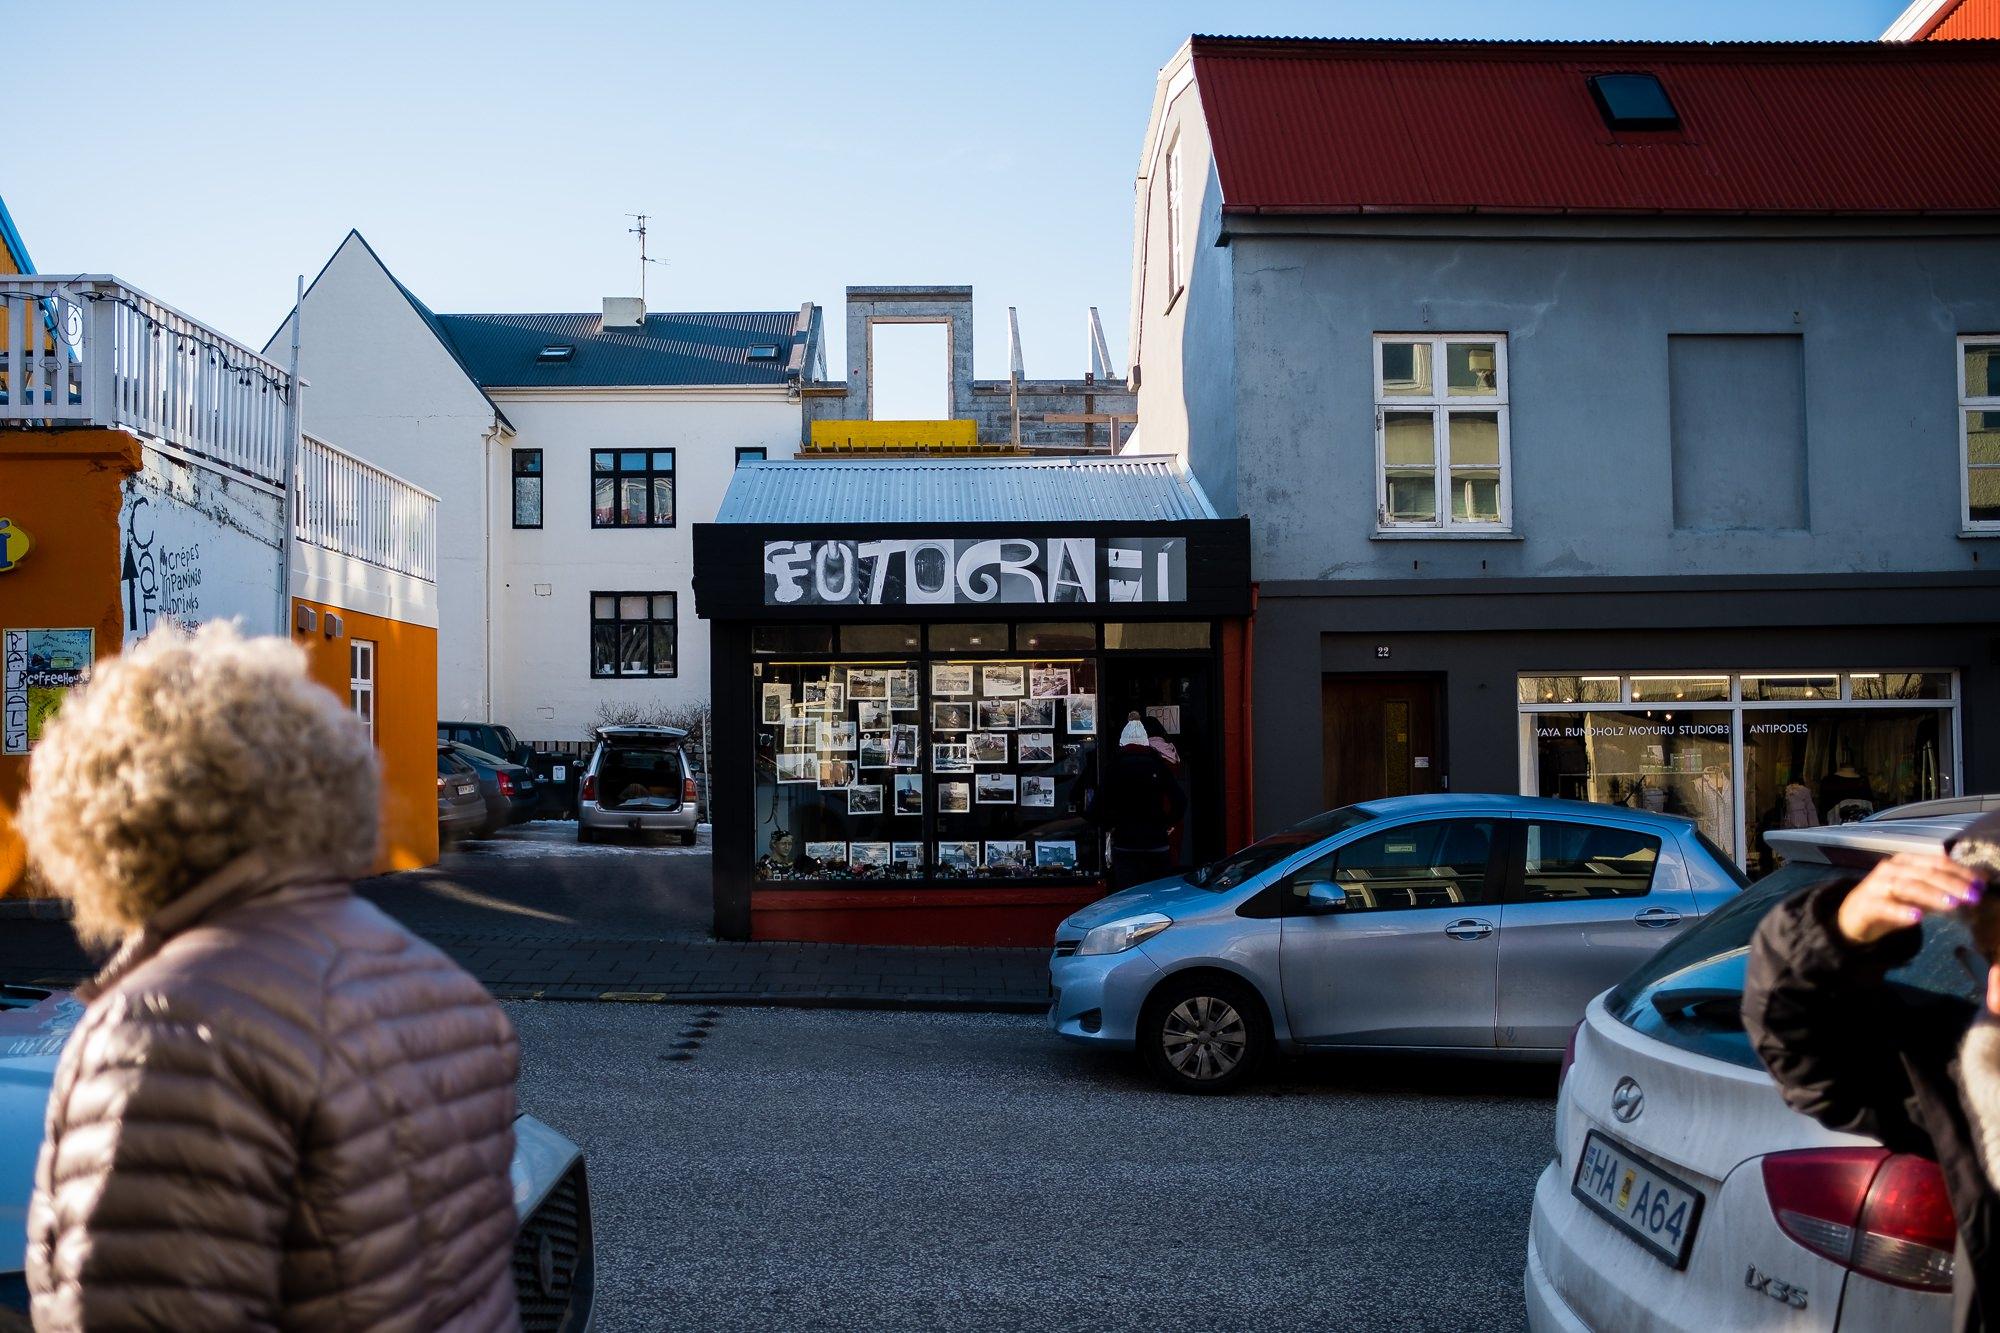 Iceland street photographer